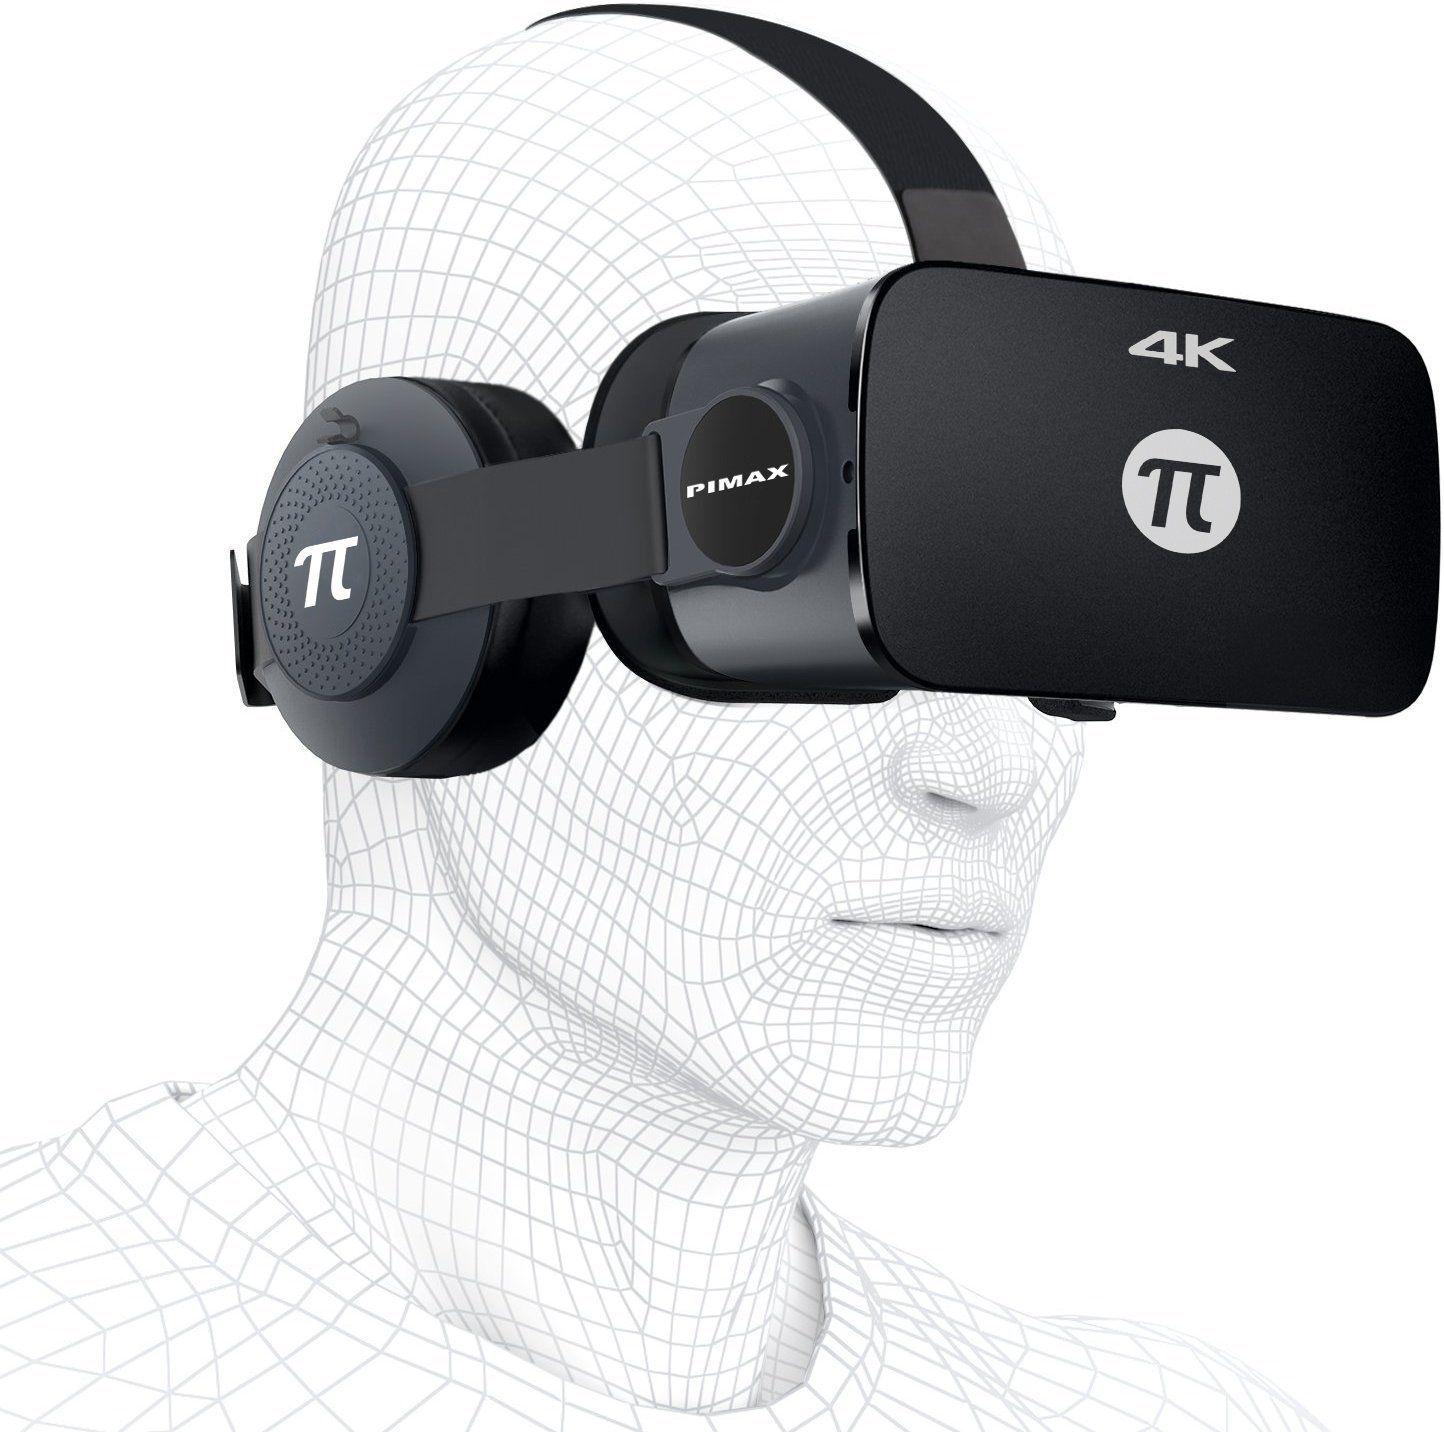 PIMAX 4K Virtual Reality Headset VR Headset 3D VR Glasses